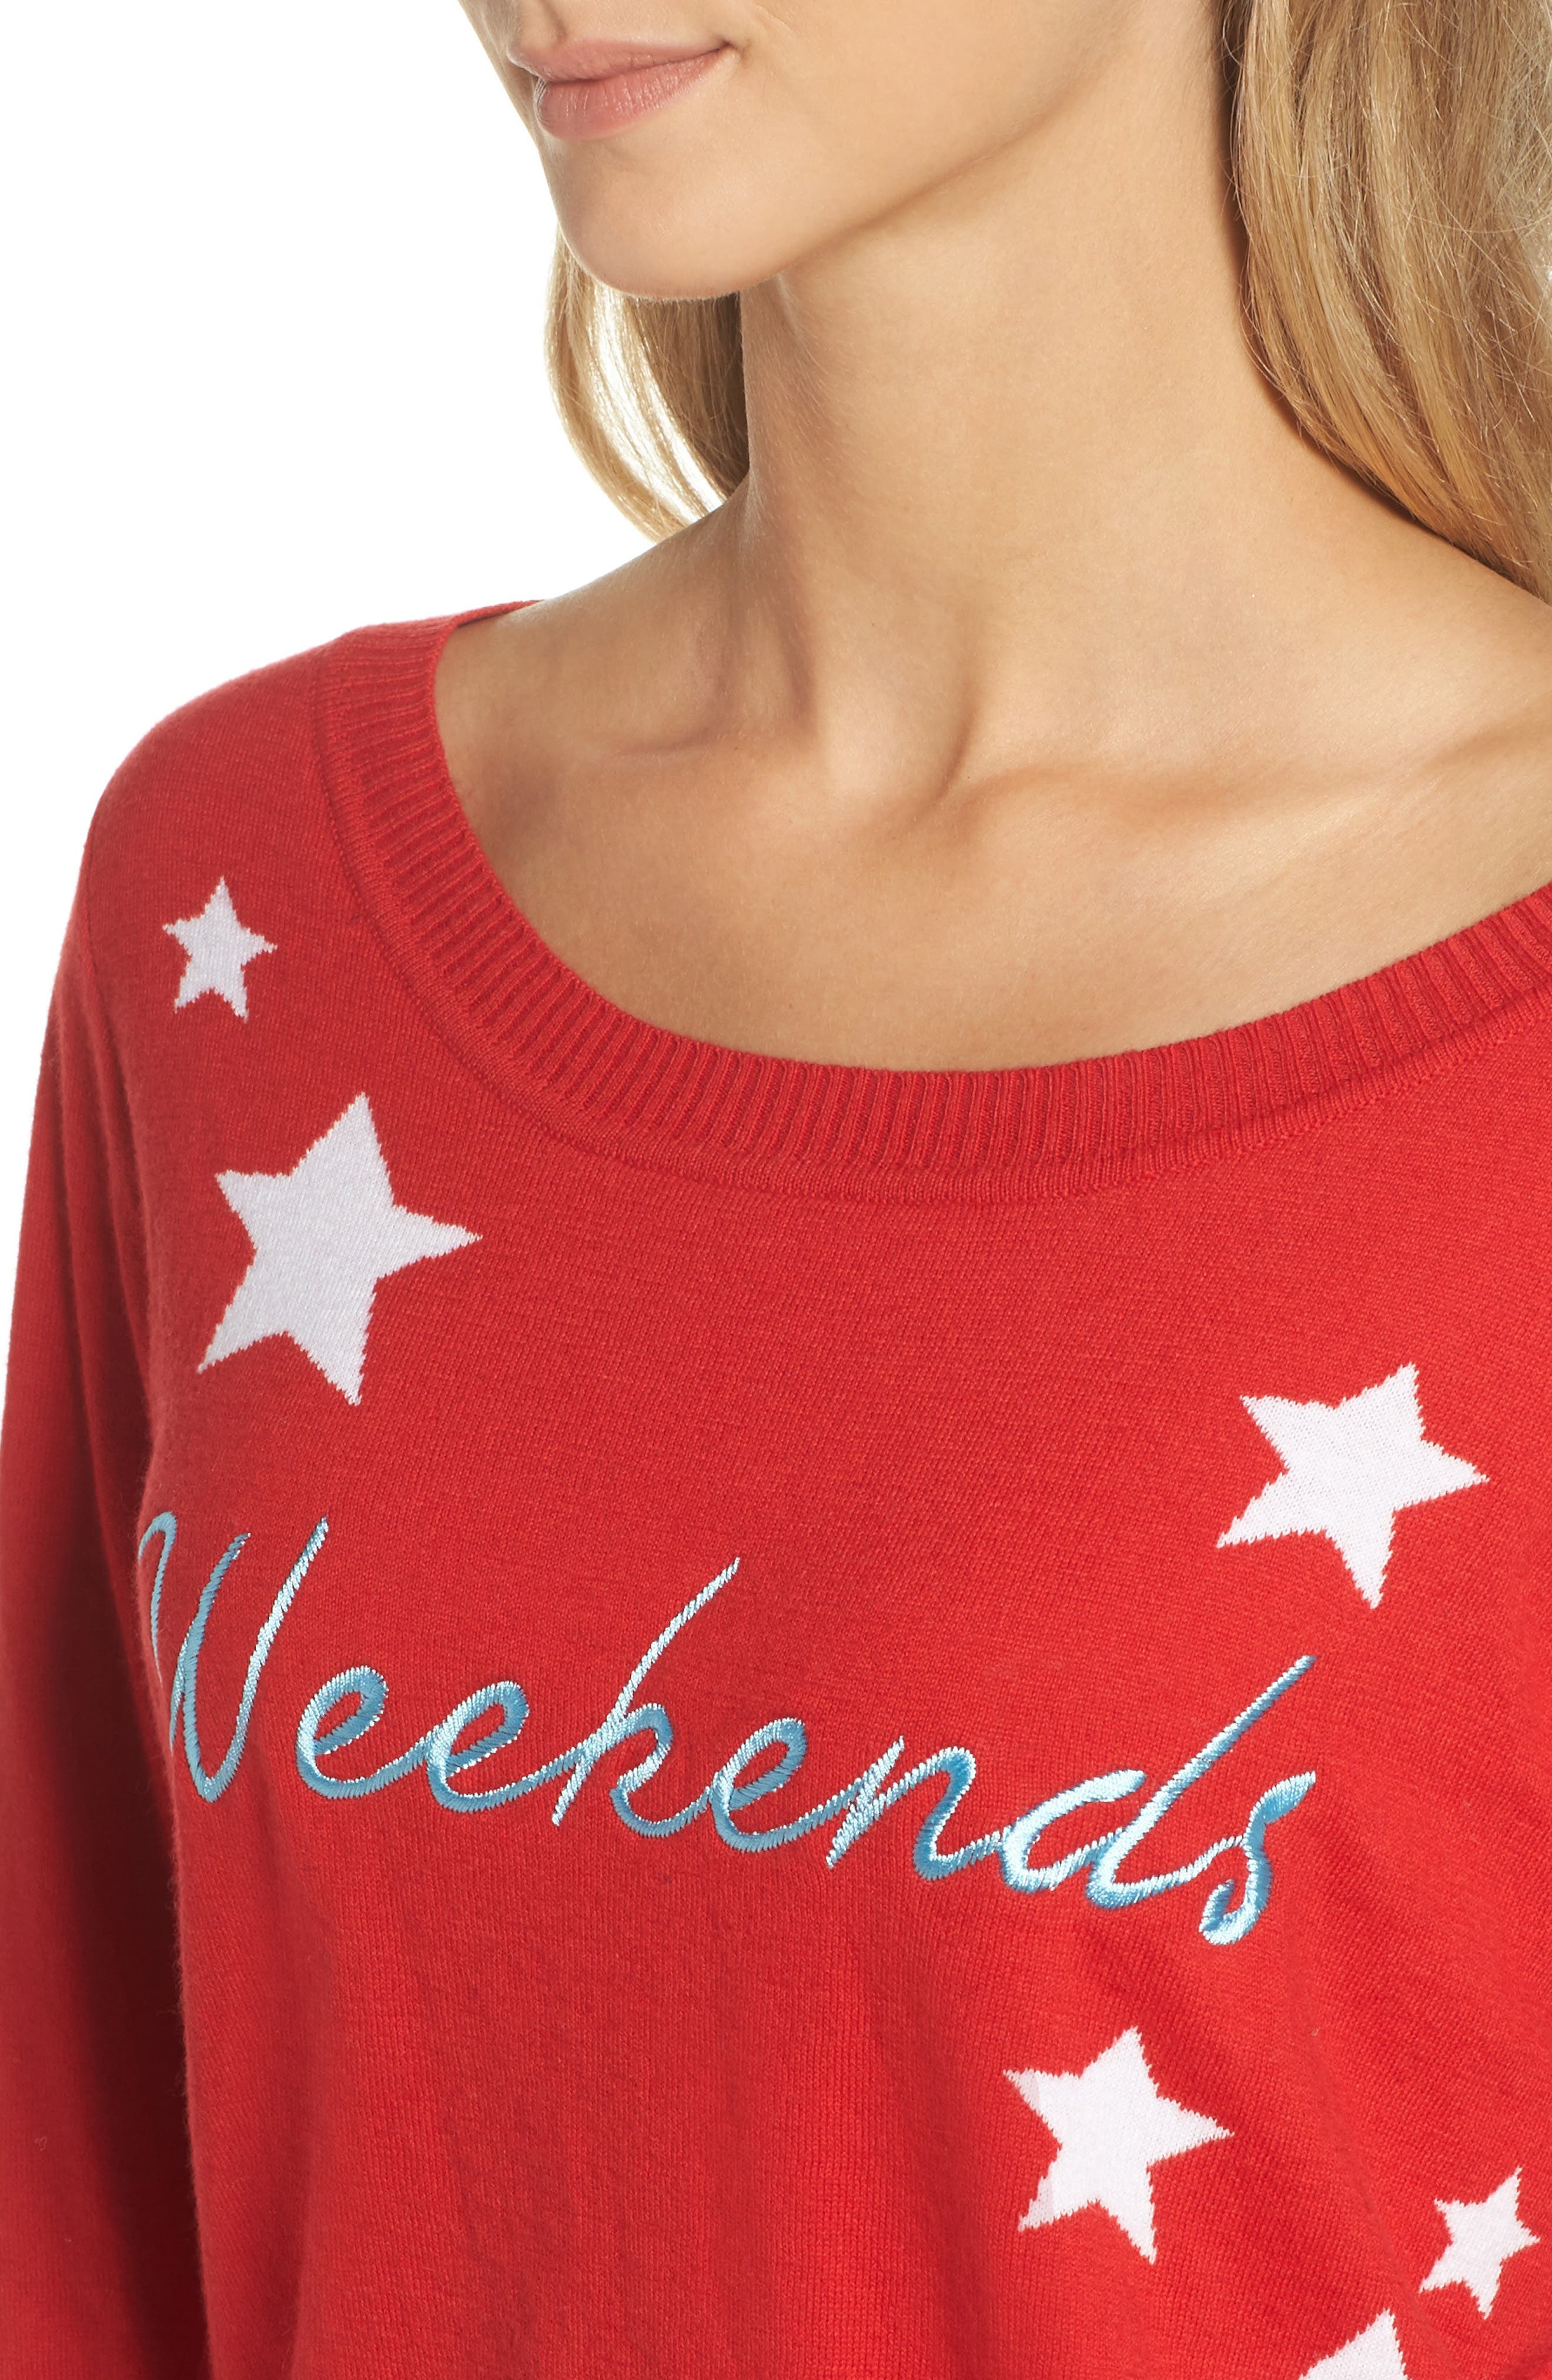 Weekends Intarsia Sweater,                             Alternate thumbnail 5, color,                             Cardinal